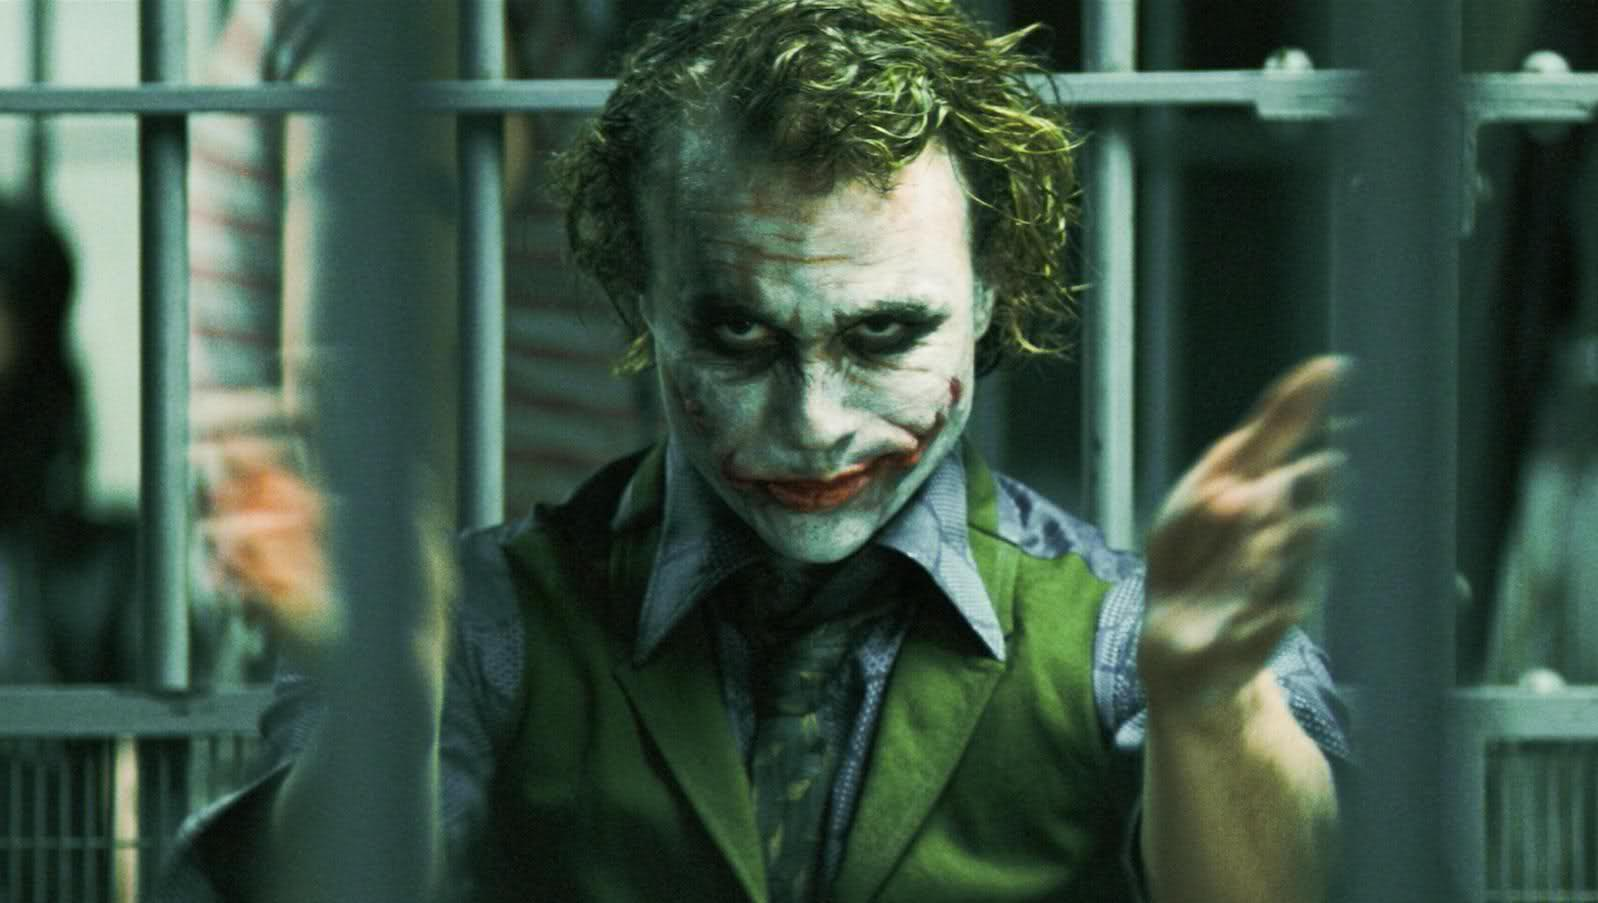 interesting-fan-theory-makes-joker-the-hero-of-the-dark-knight